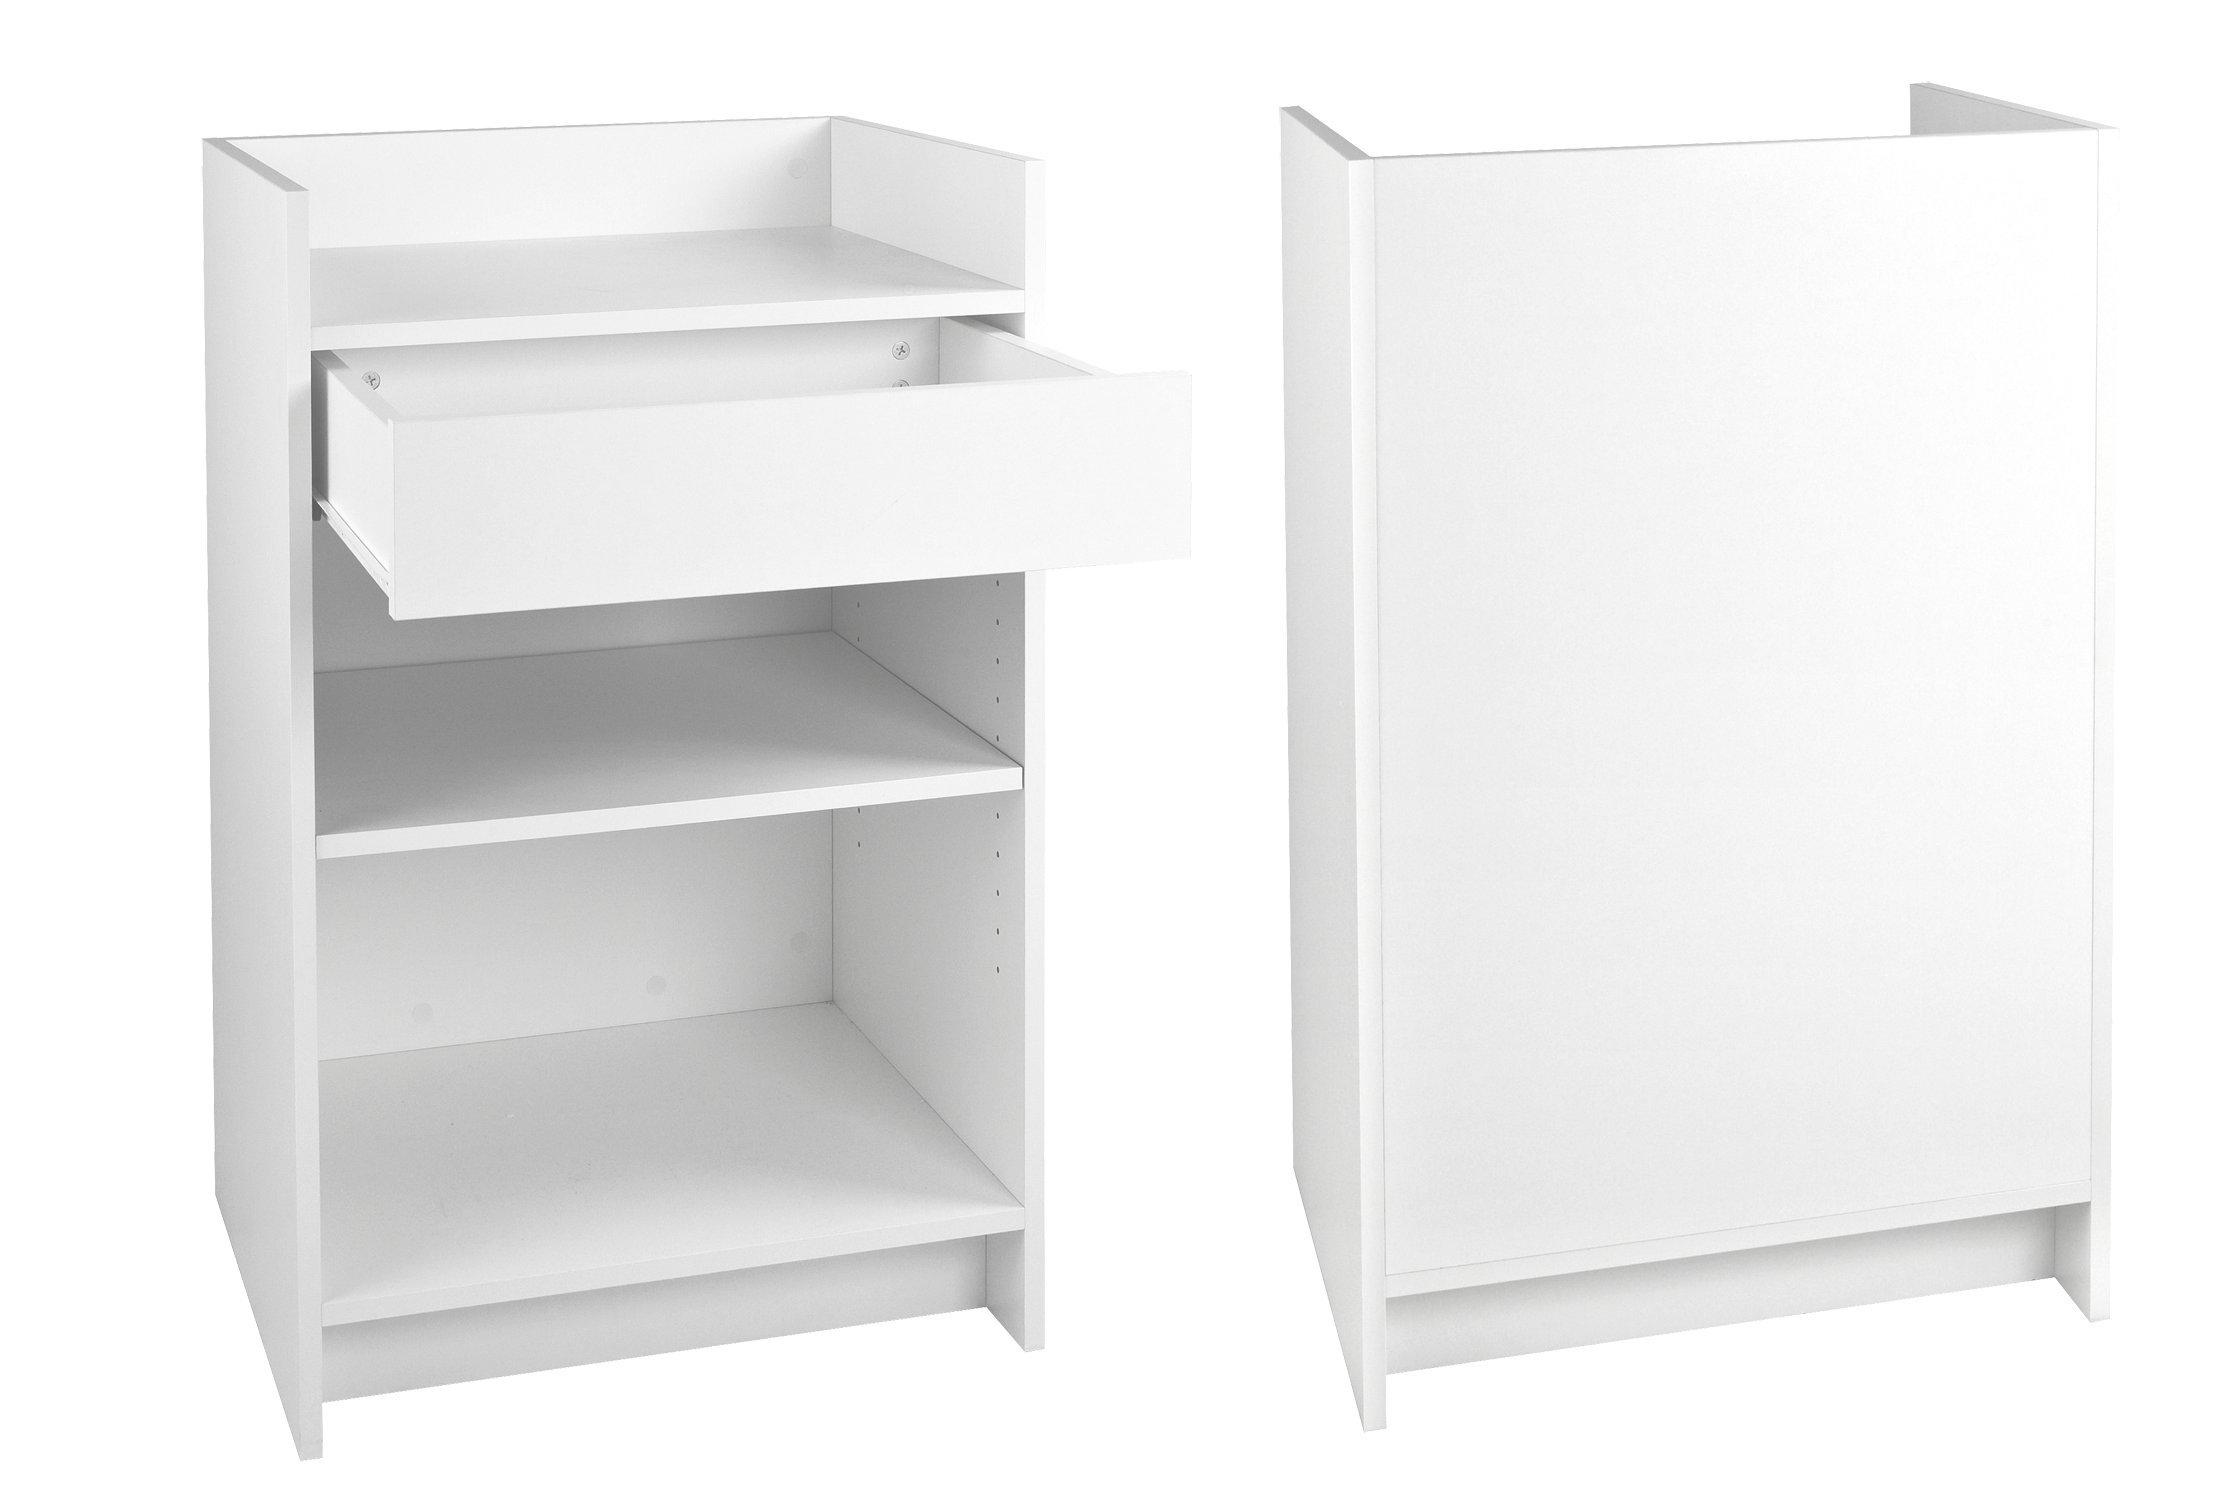 Wood Cash Register Stand, Adjustable Shelf, Drawer, 24'' W X 38'' H X 18'' D (White Melamine) by Only Garment Racks